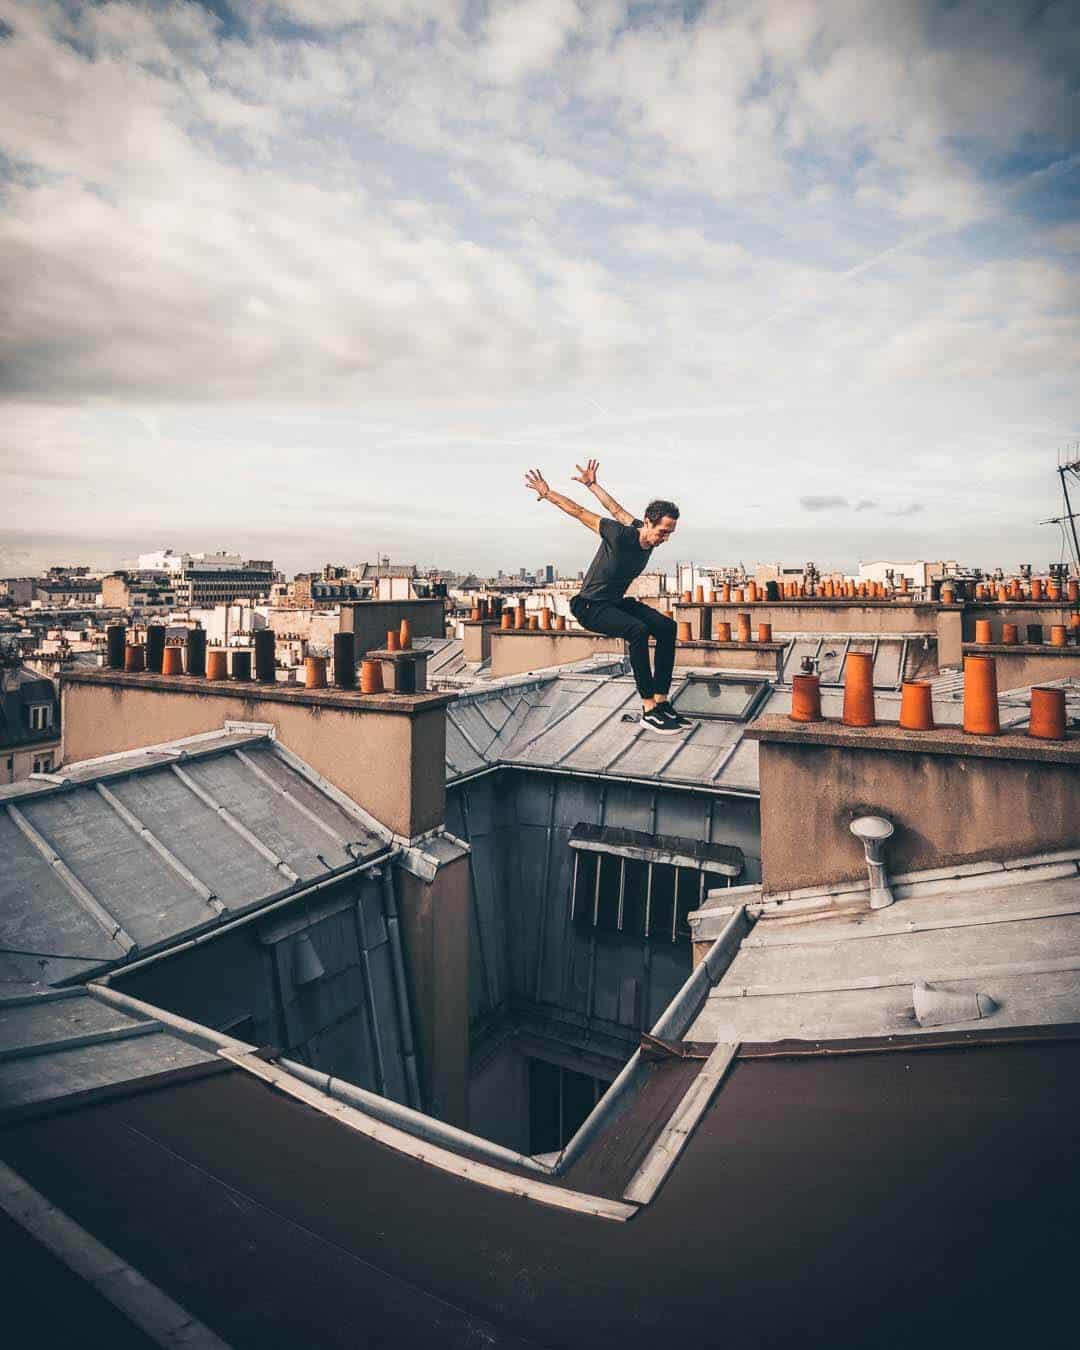 etrefort thibaut parkour clothing outdor paris rooftop pov flying